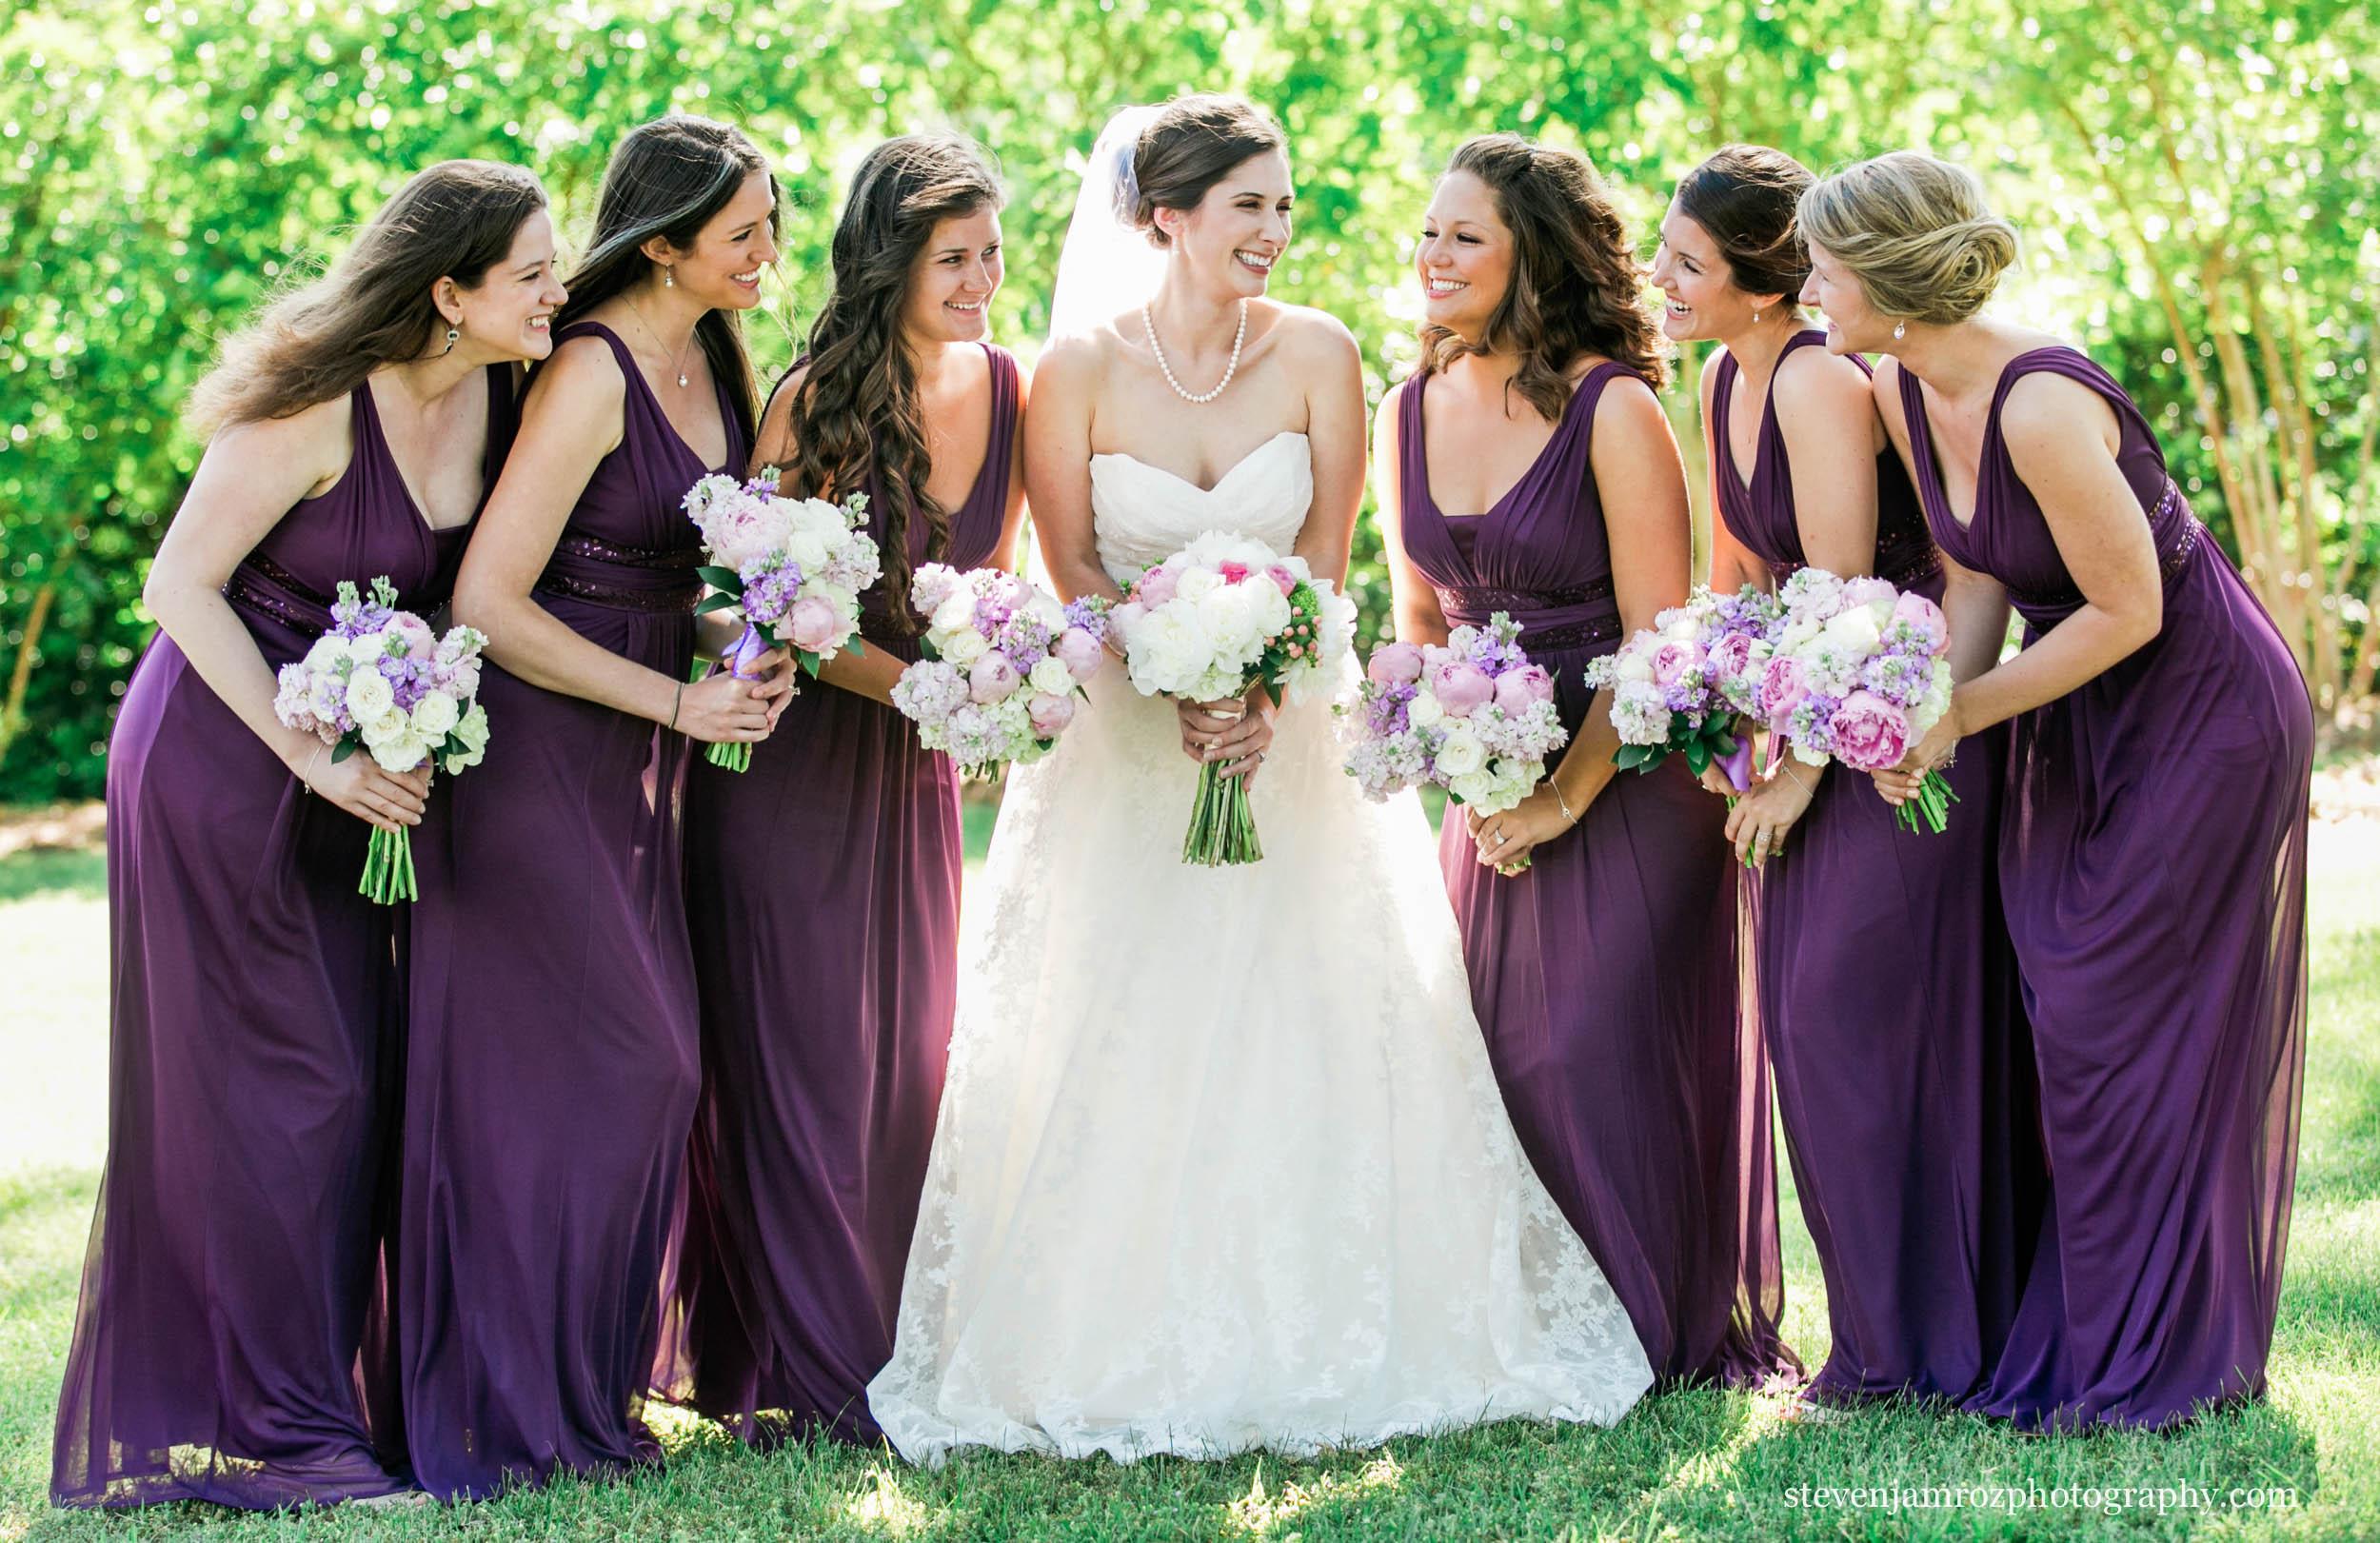 purple-dress-bridal-party-hudson-manor-estate-0874.jpg